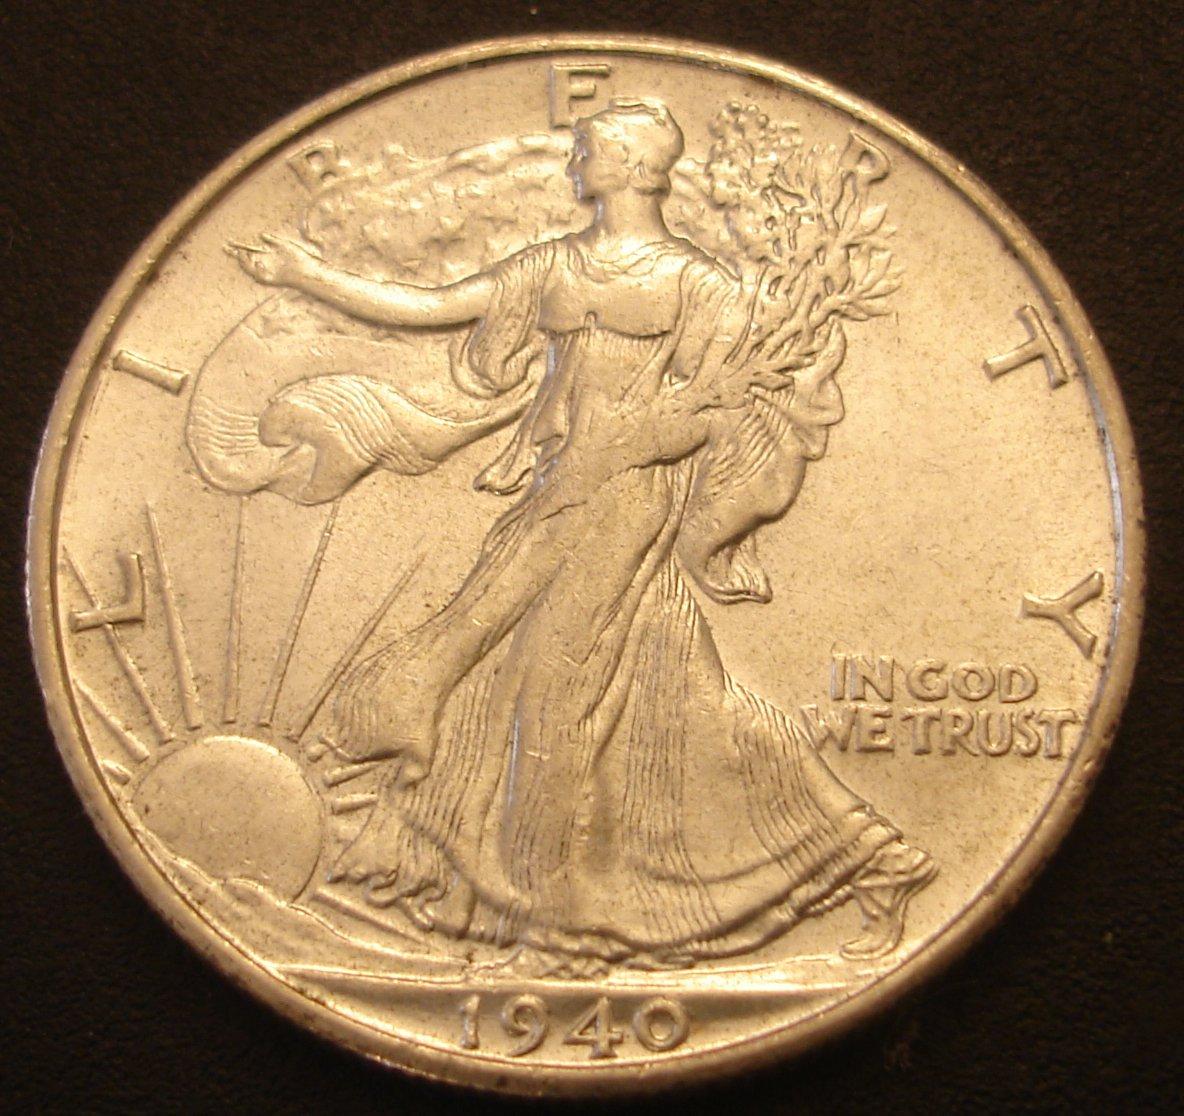 image of a quarter coin